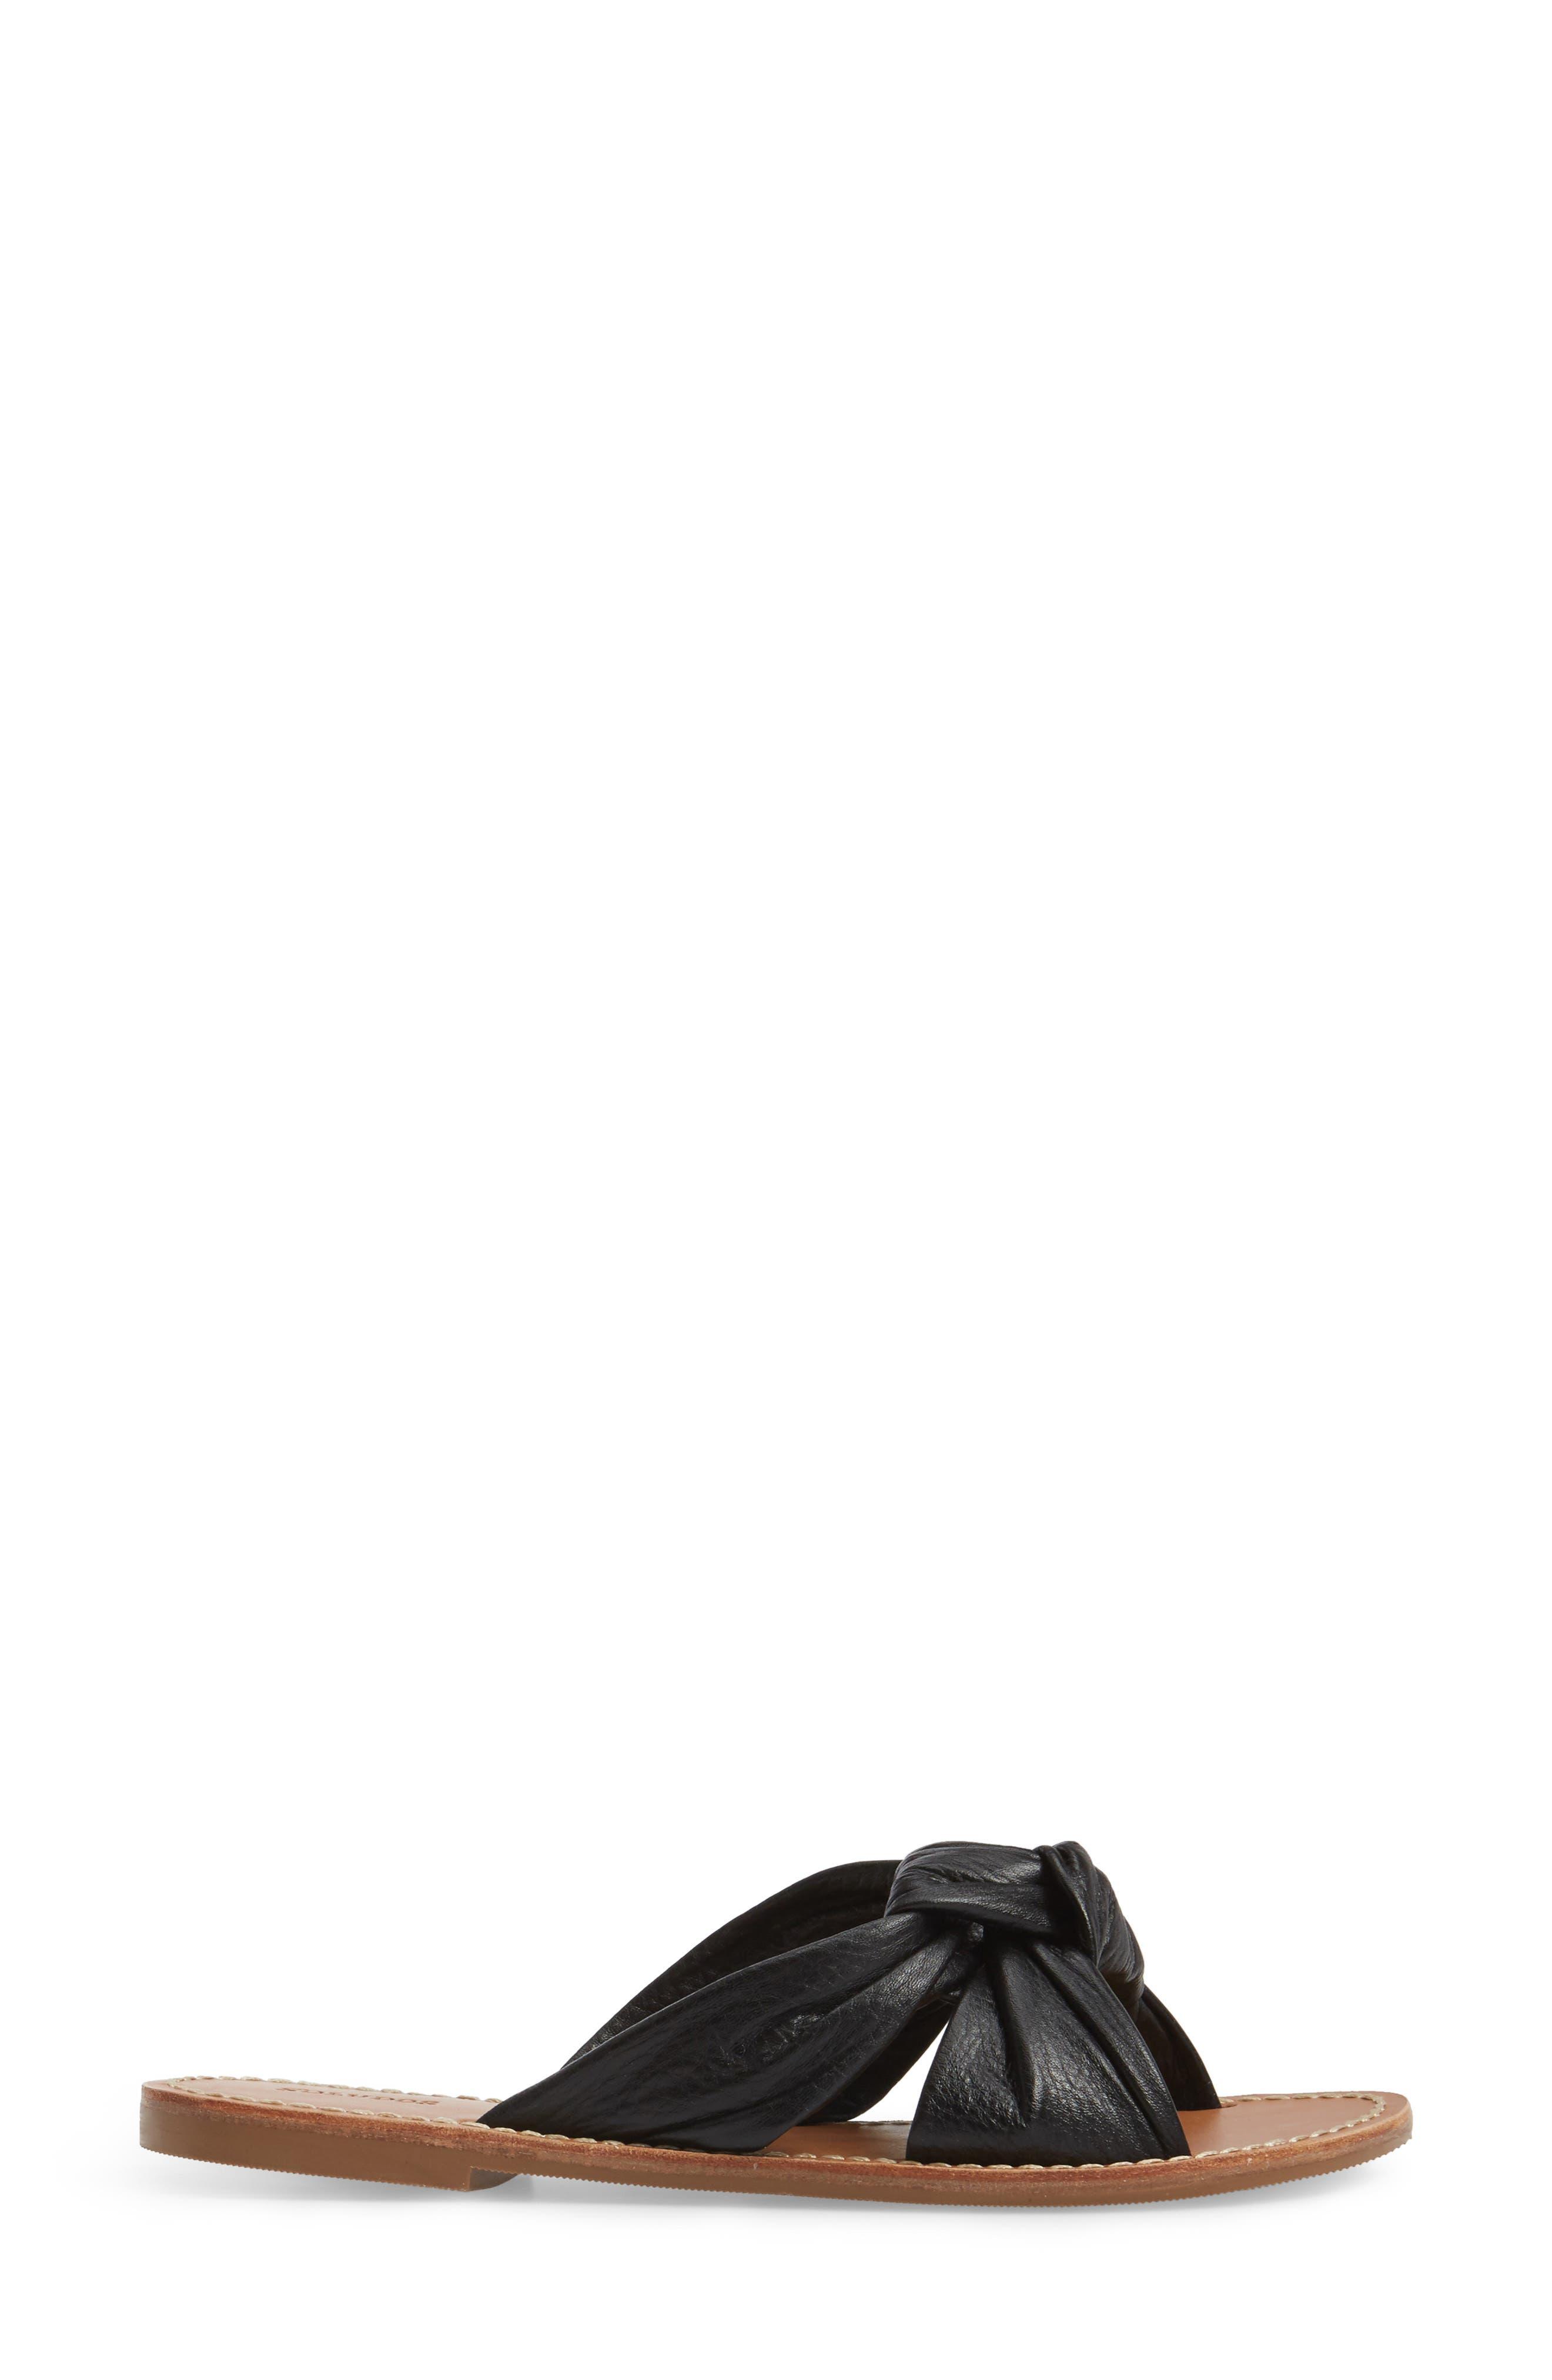 Alternate Image 3  - Soludos Knotted Slide Sandal (Women)